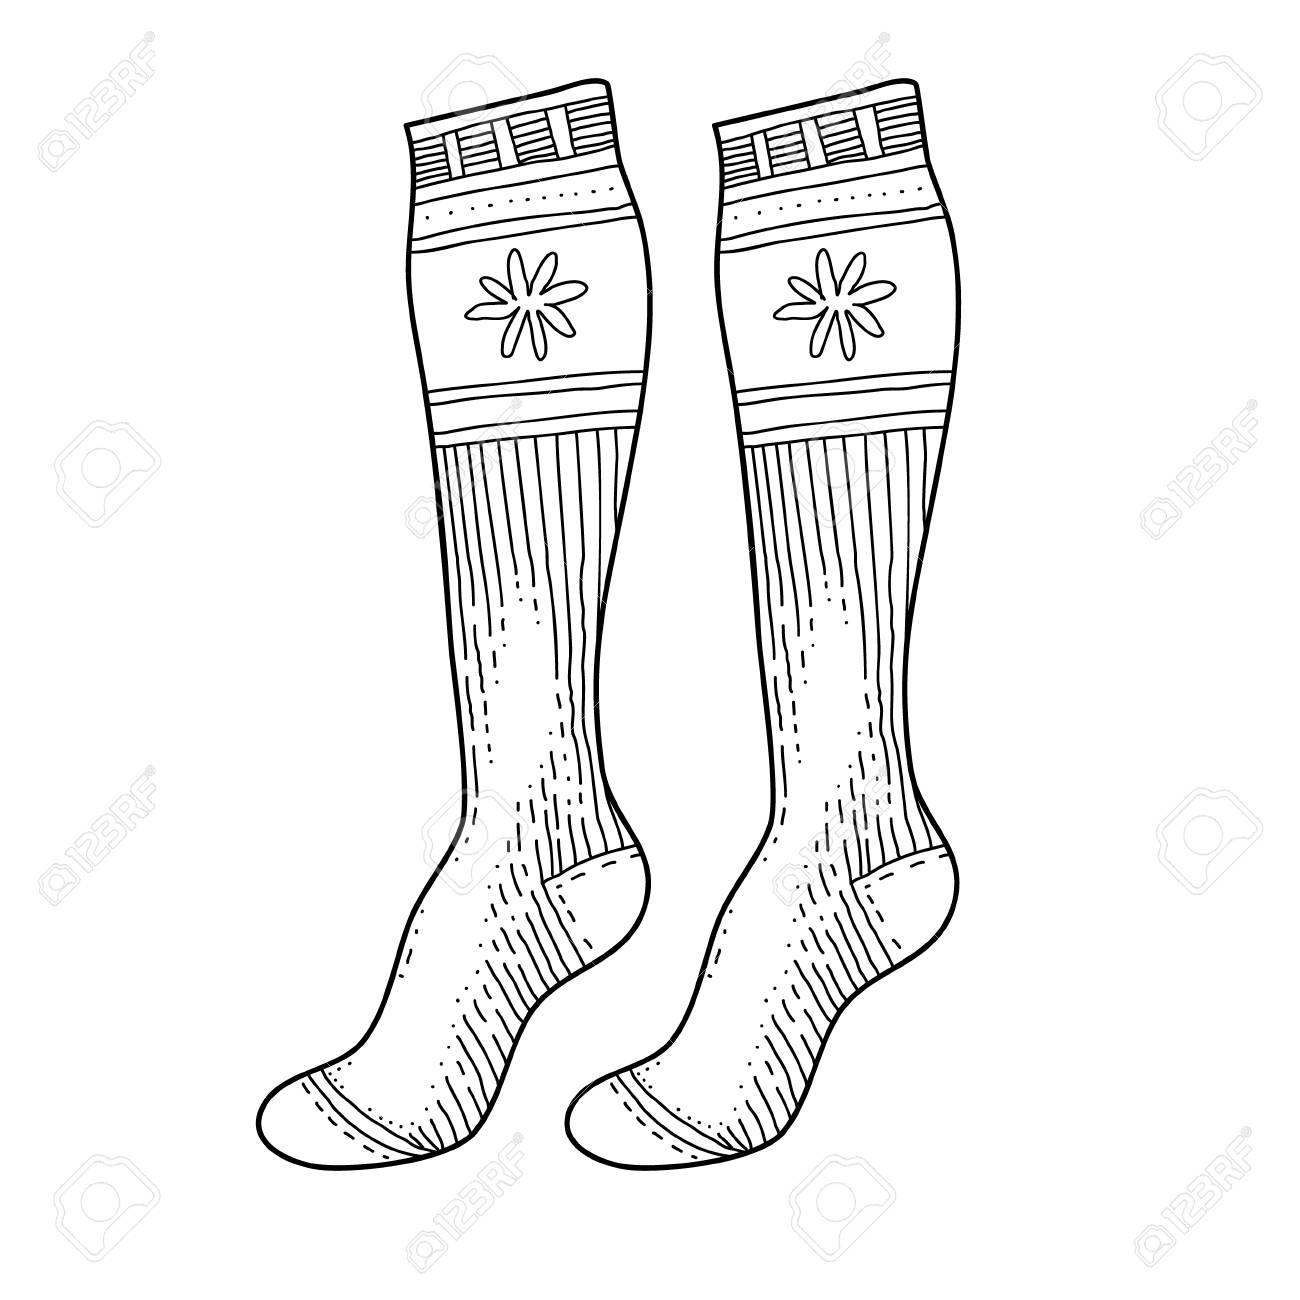 Drawings Of Christmas Stockings.Black Engraved Socks Drawing Winter Warm Christmas Stockings